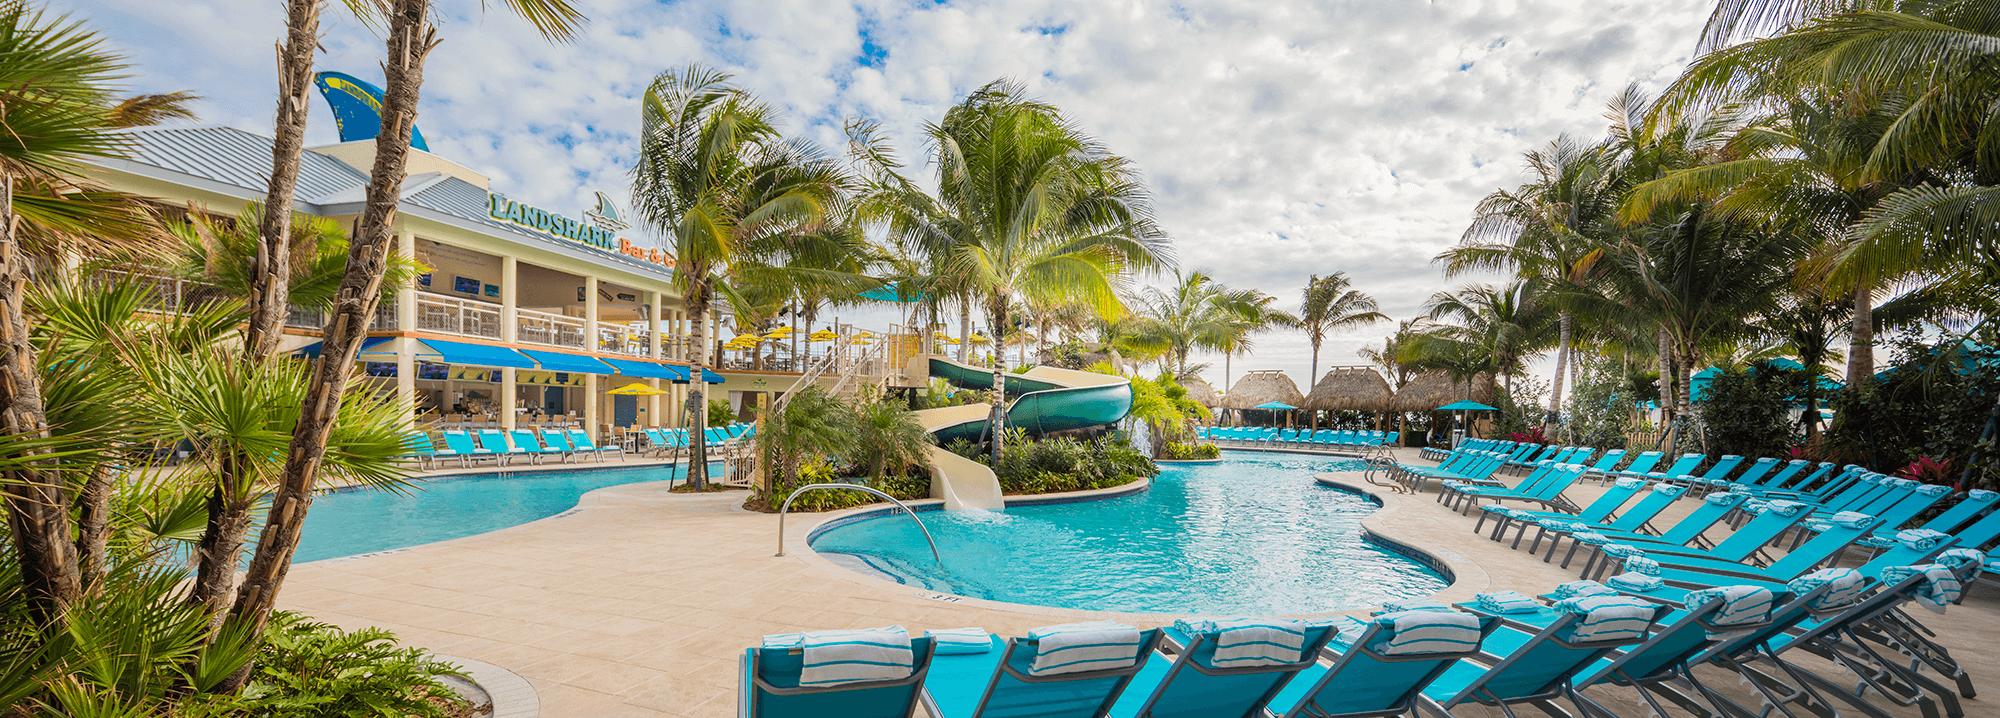 Registration margaritaville hollywood beach resort for Florida pool show 2015